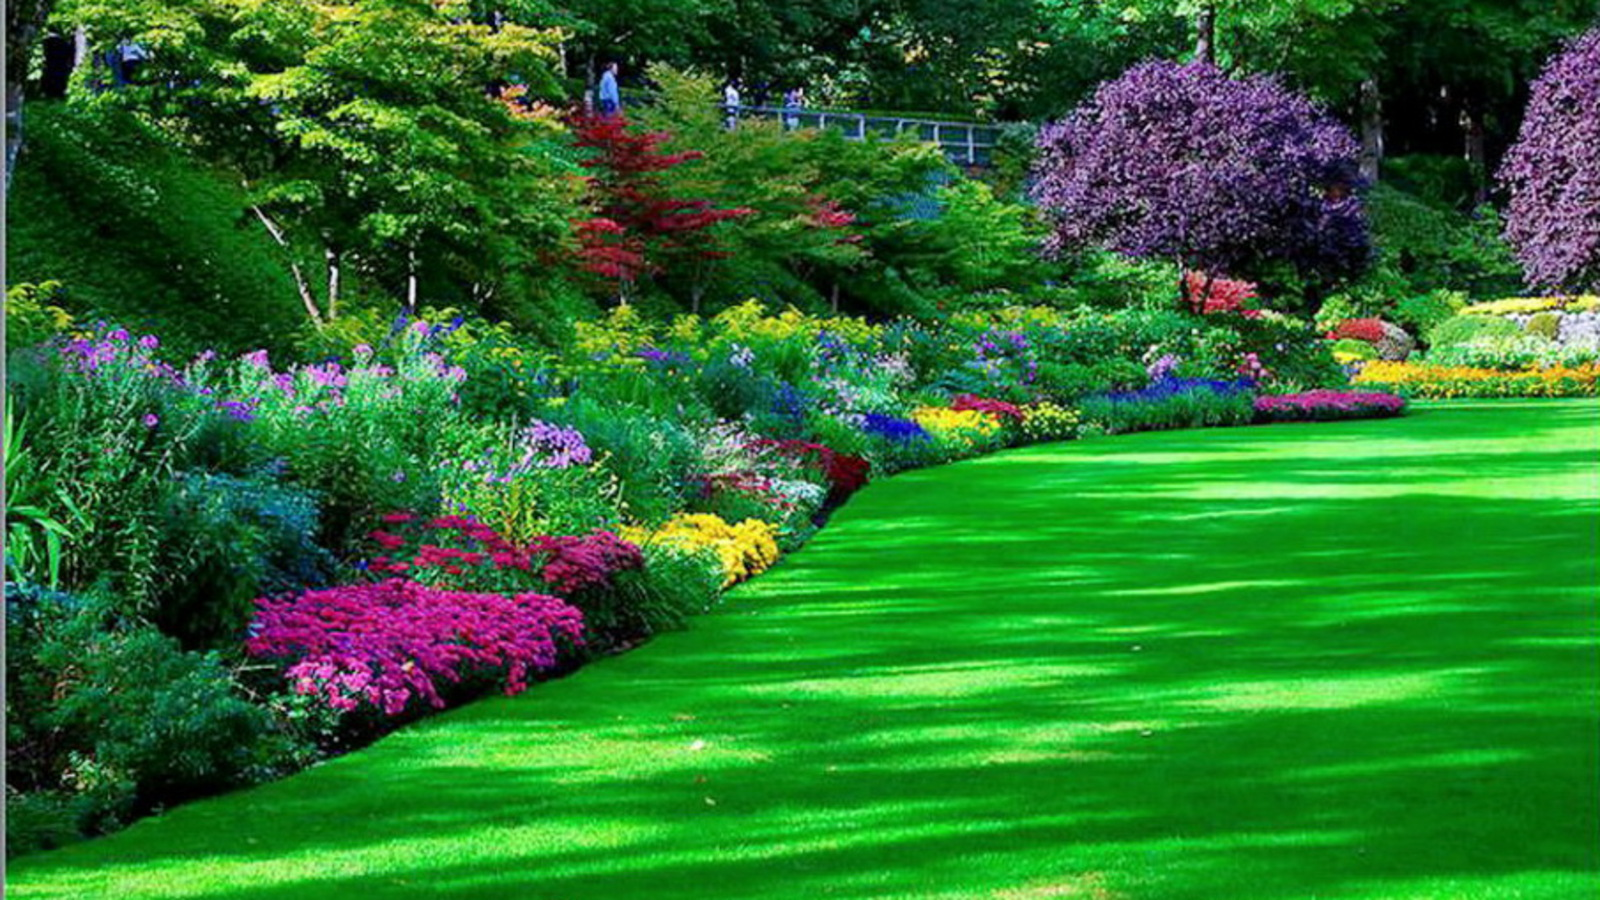 Garden Wallpapers HD 1600x900